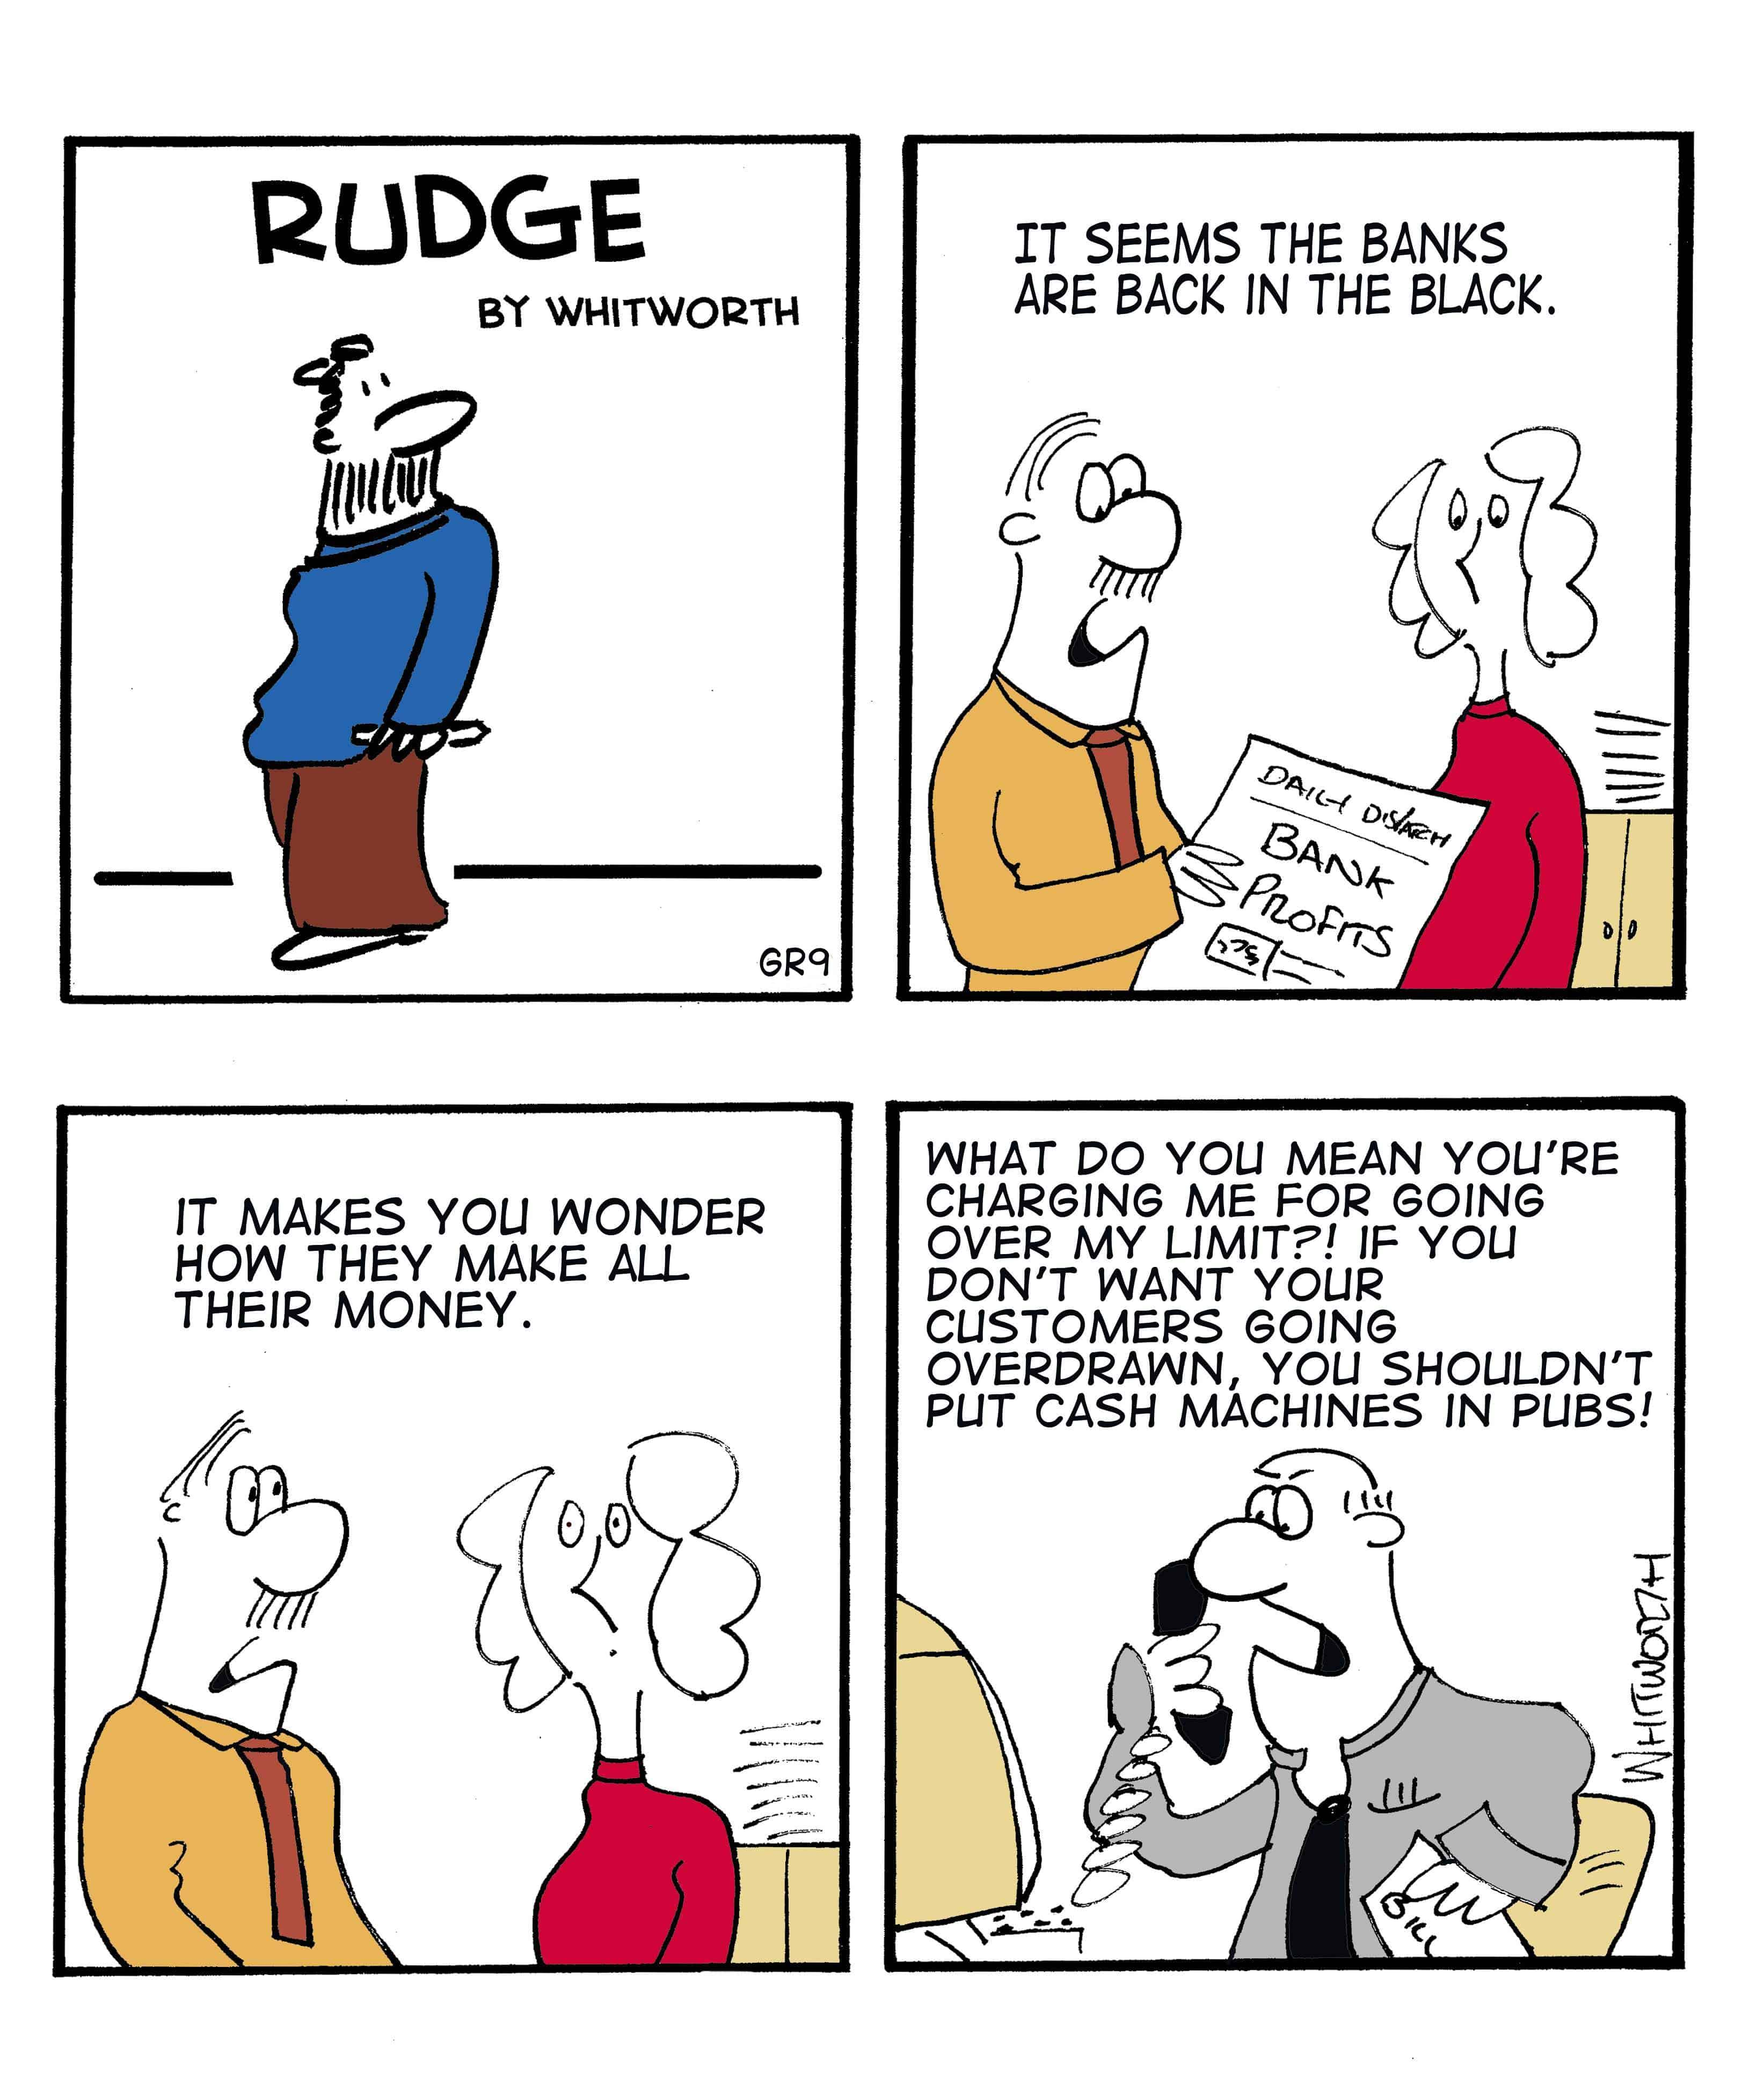 rudge gr9